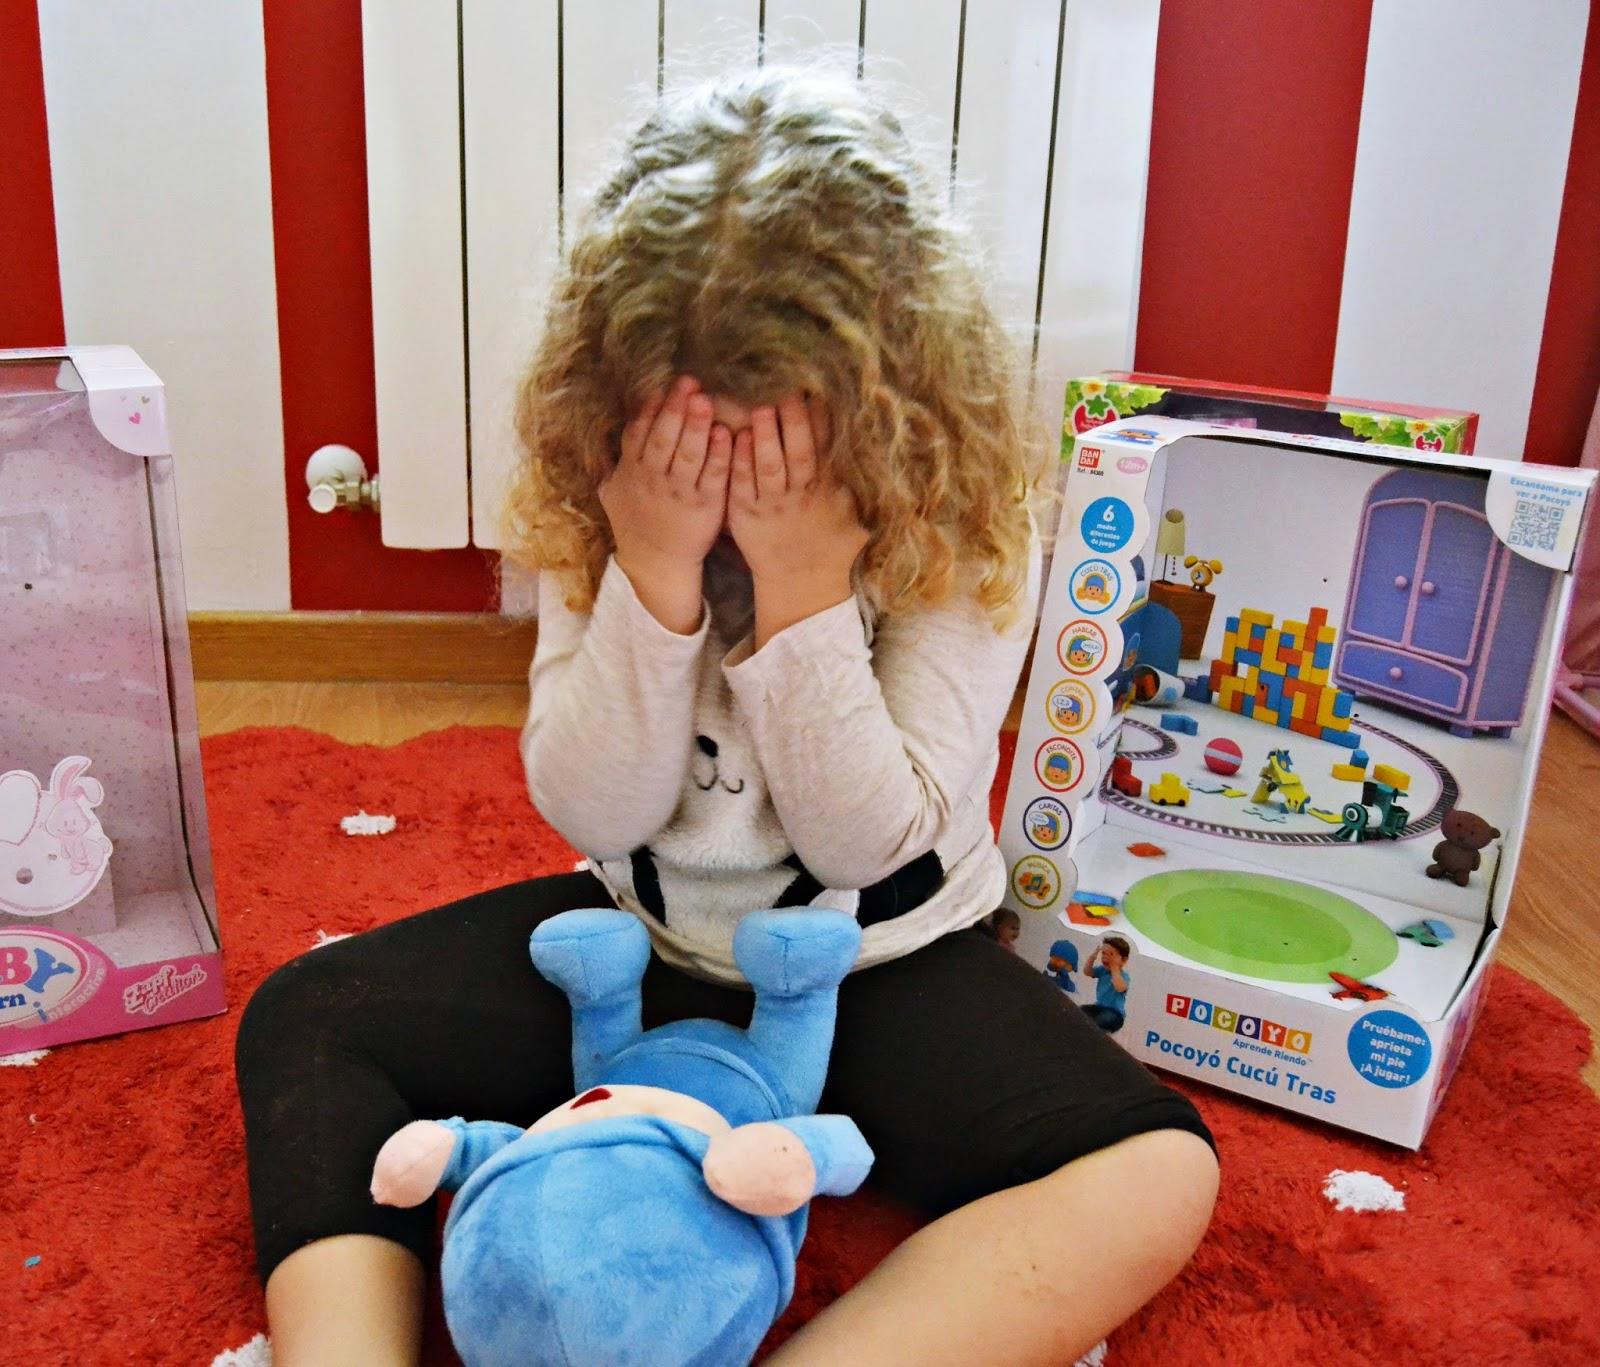 hemos probado pocoyo cucu tras de bandai review blog infantil mama de noa